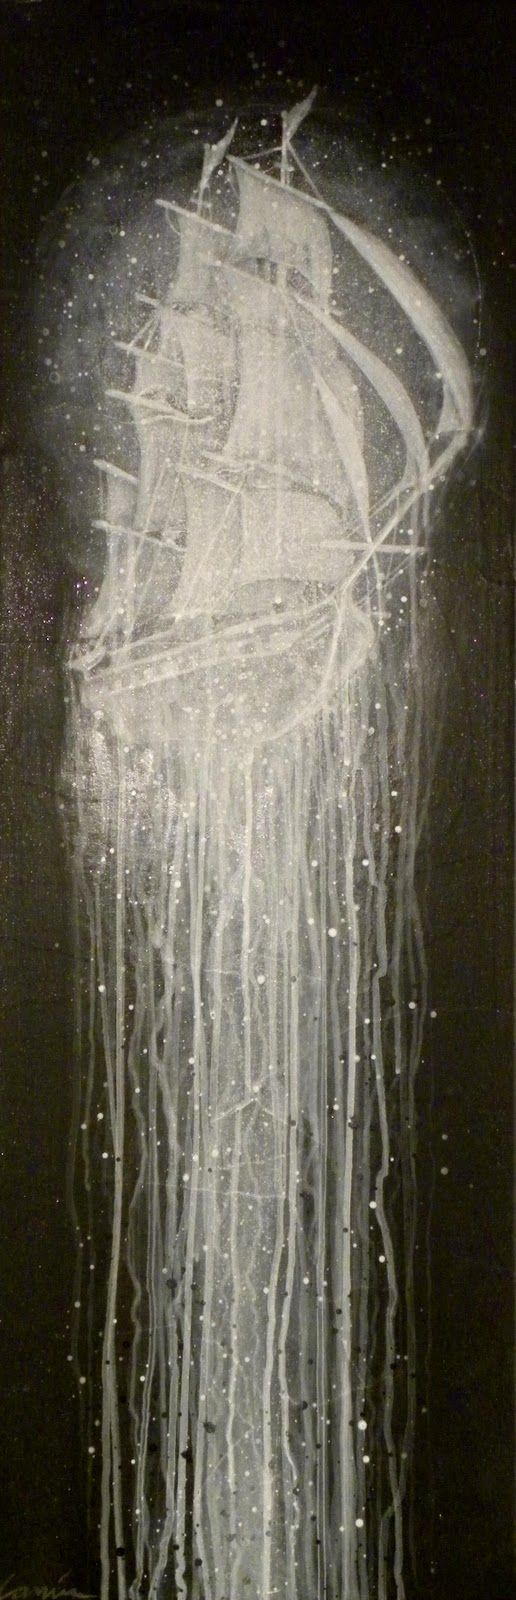 "Bryan Keith Lanier, ""Man-O-War"",2010  (12"" X 36"")  acrylic,glitter,papier-mache',canvas,wood"